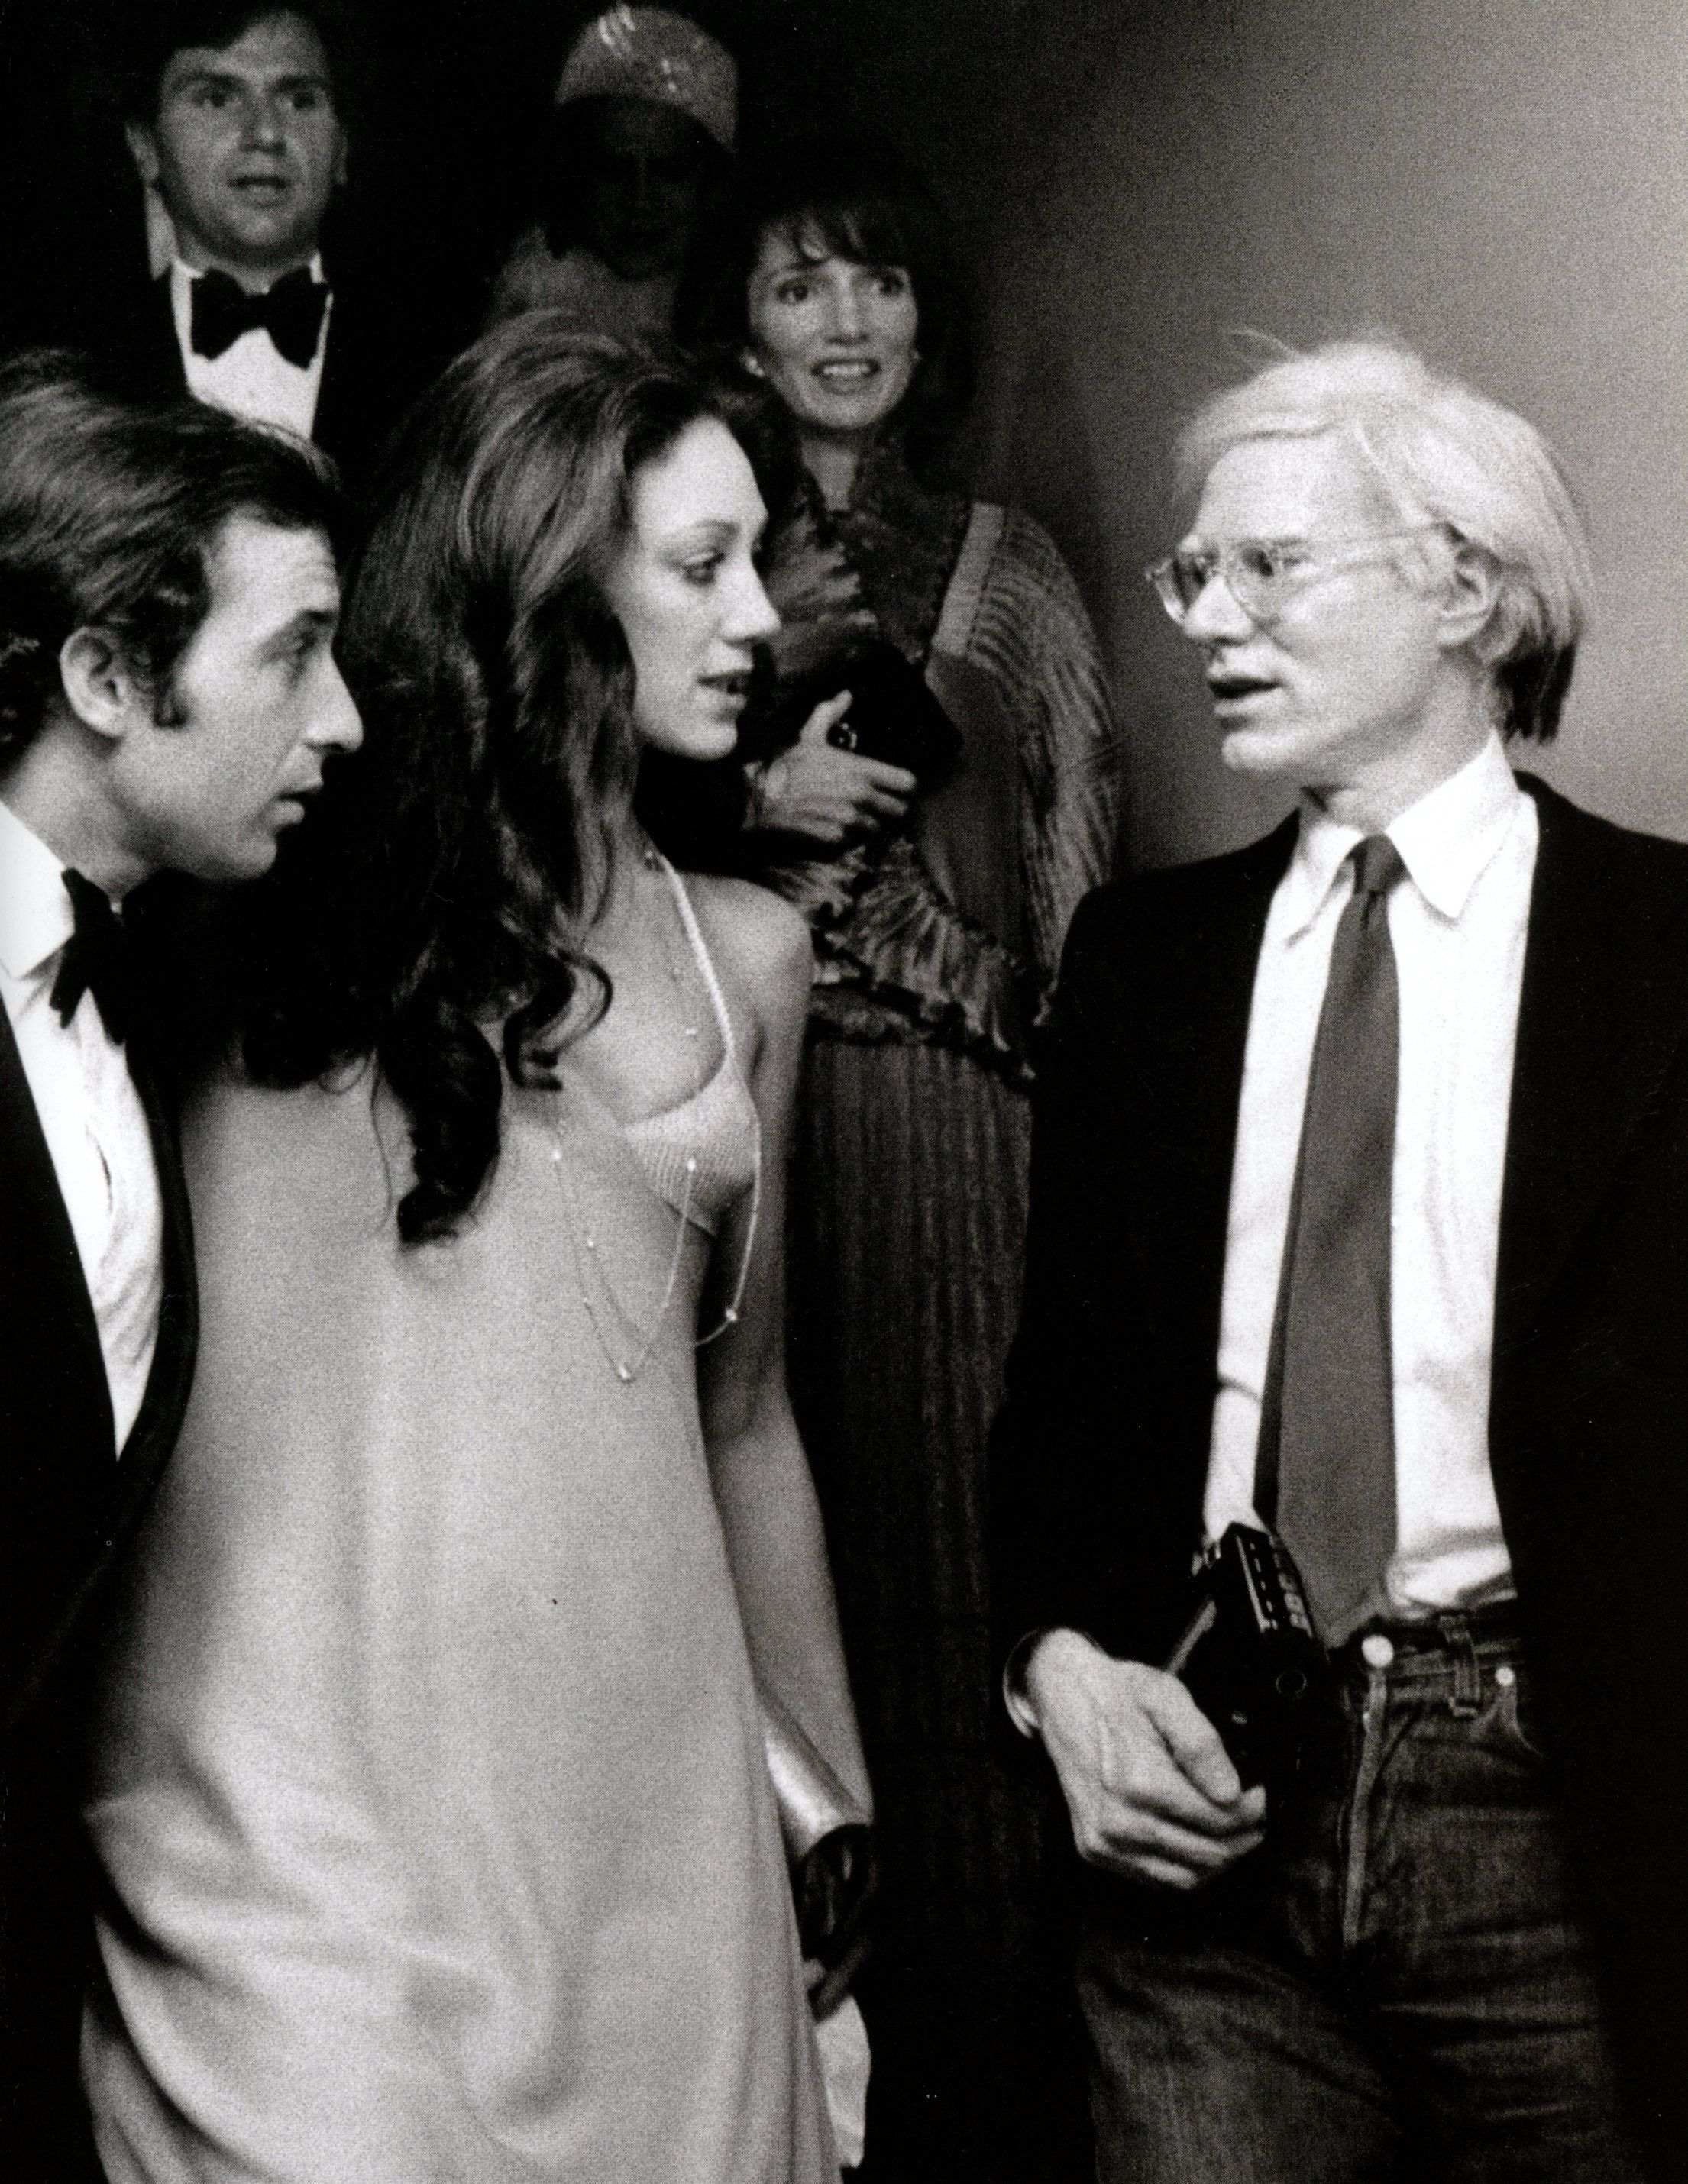 RICKY VON OPEL, MARISA BERENSON & ANDY WARHOL-NEW YORK-1975